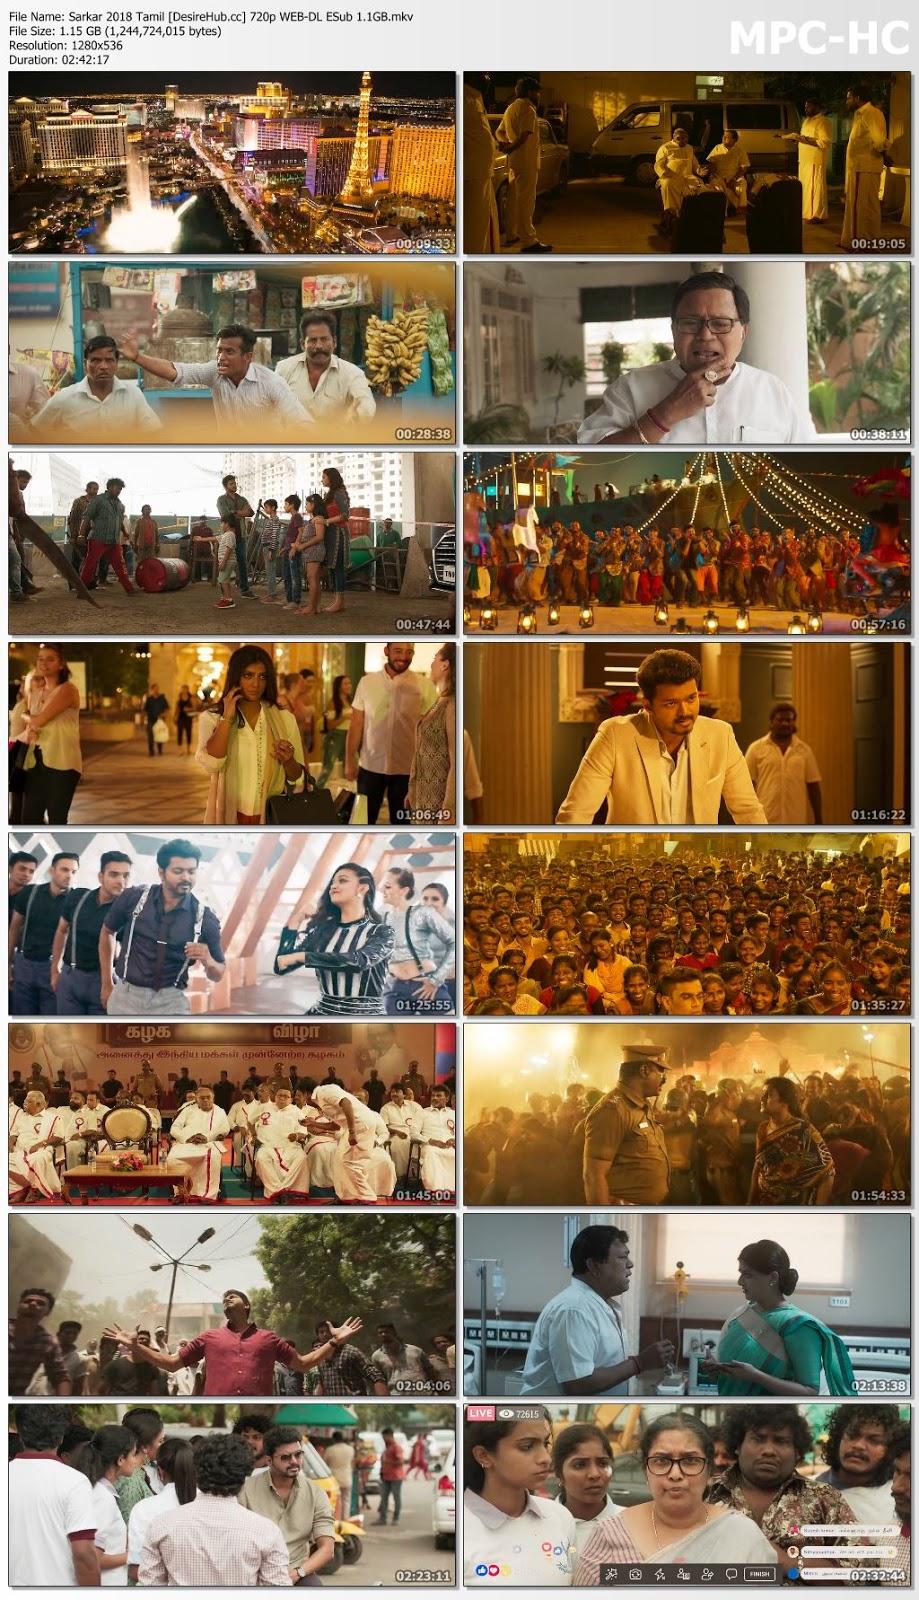 Sarkar 2018 Tamil 480p WEB-DL ESub 400MB Desirehub